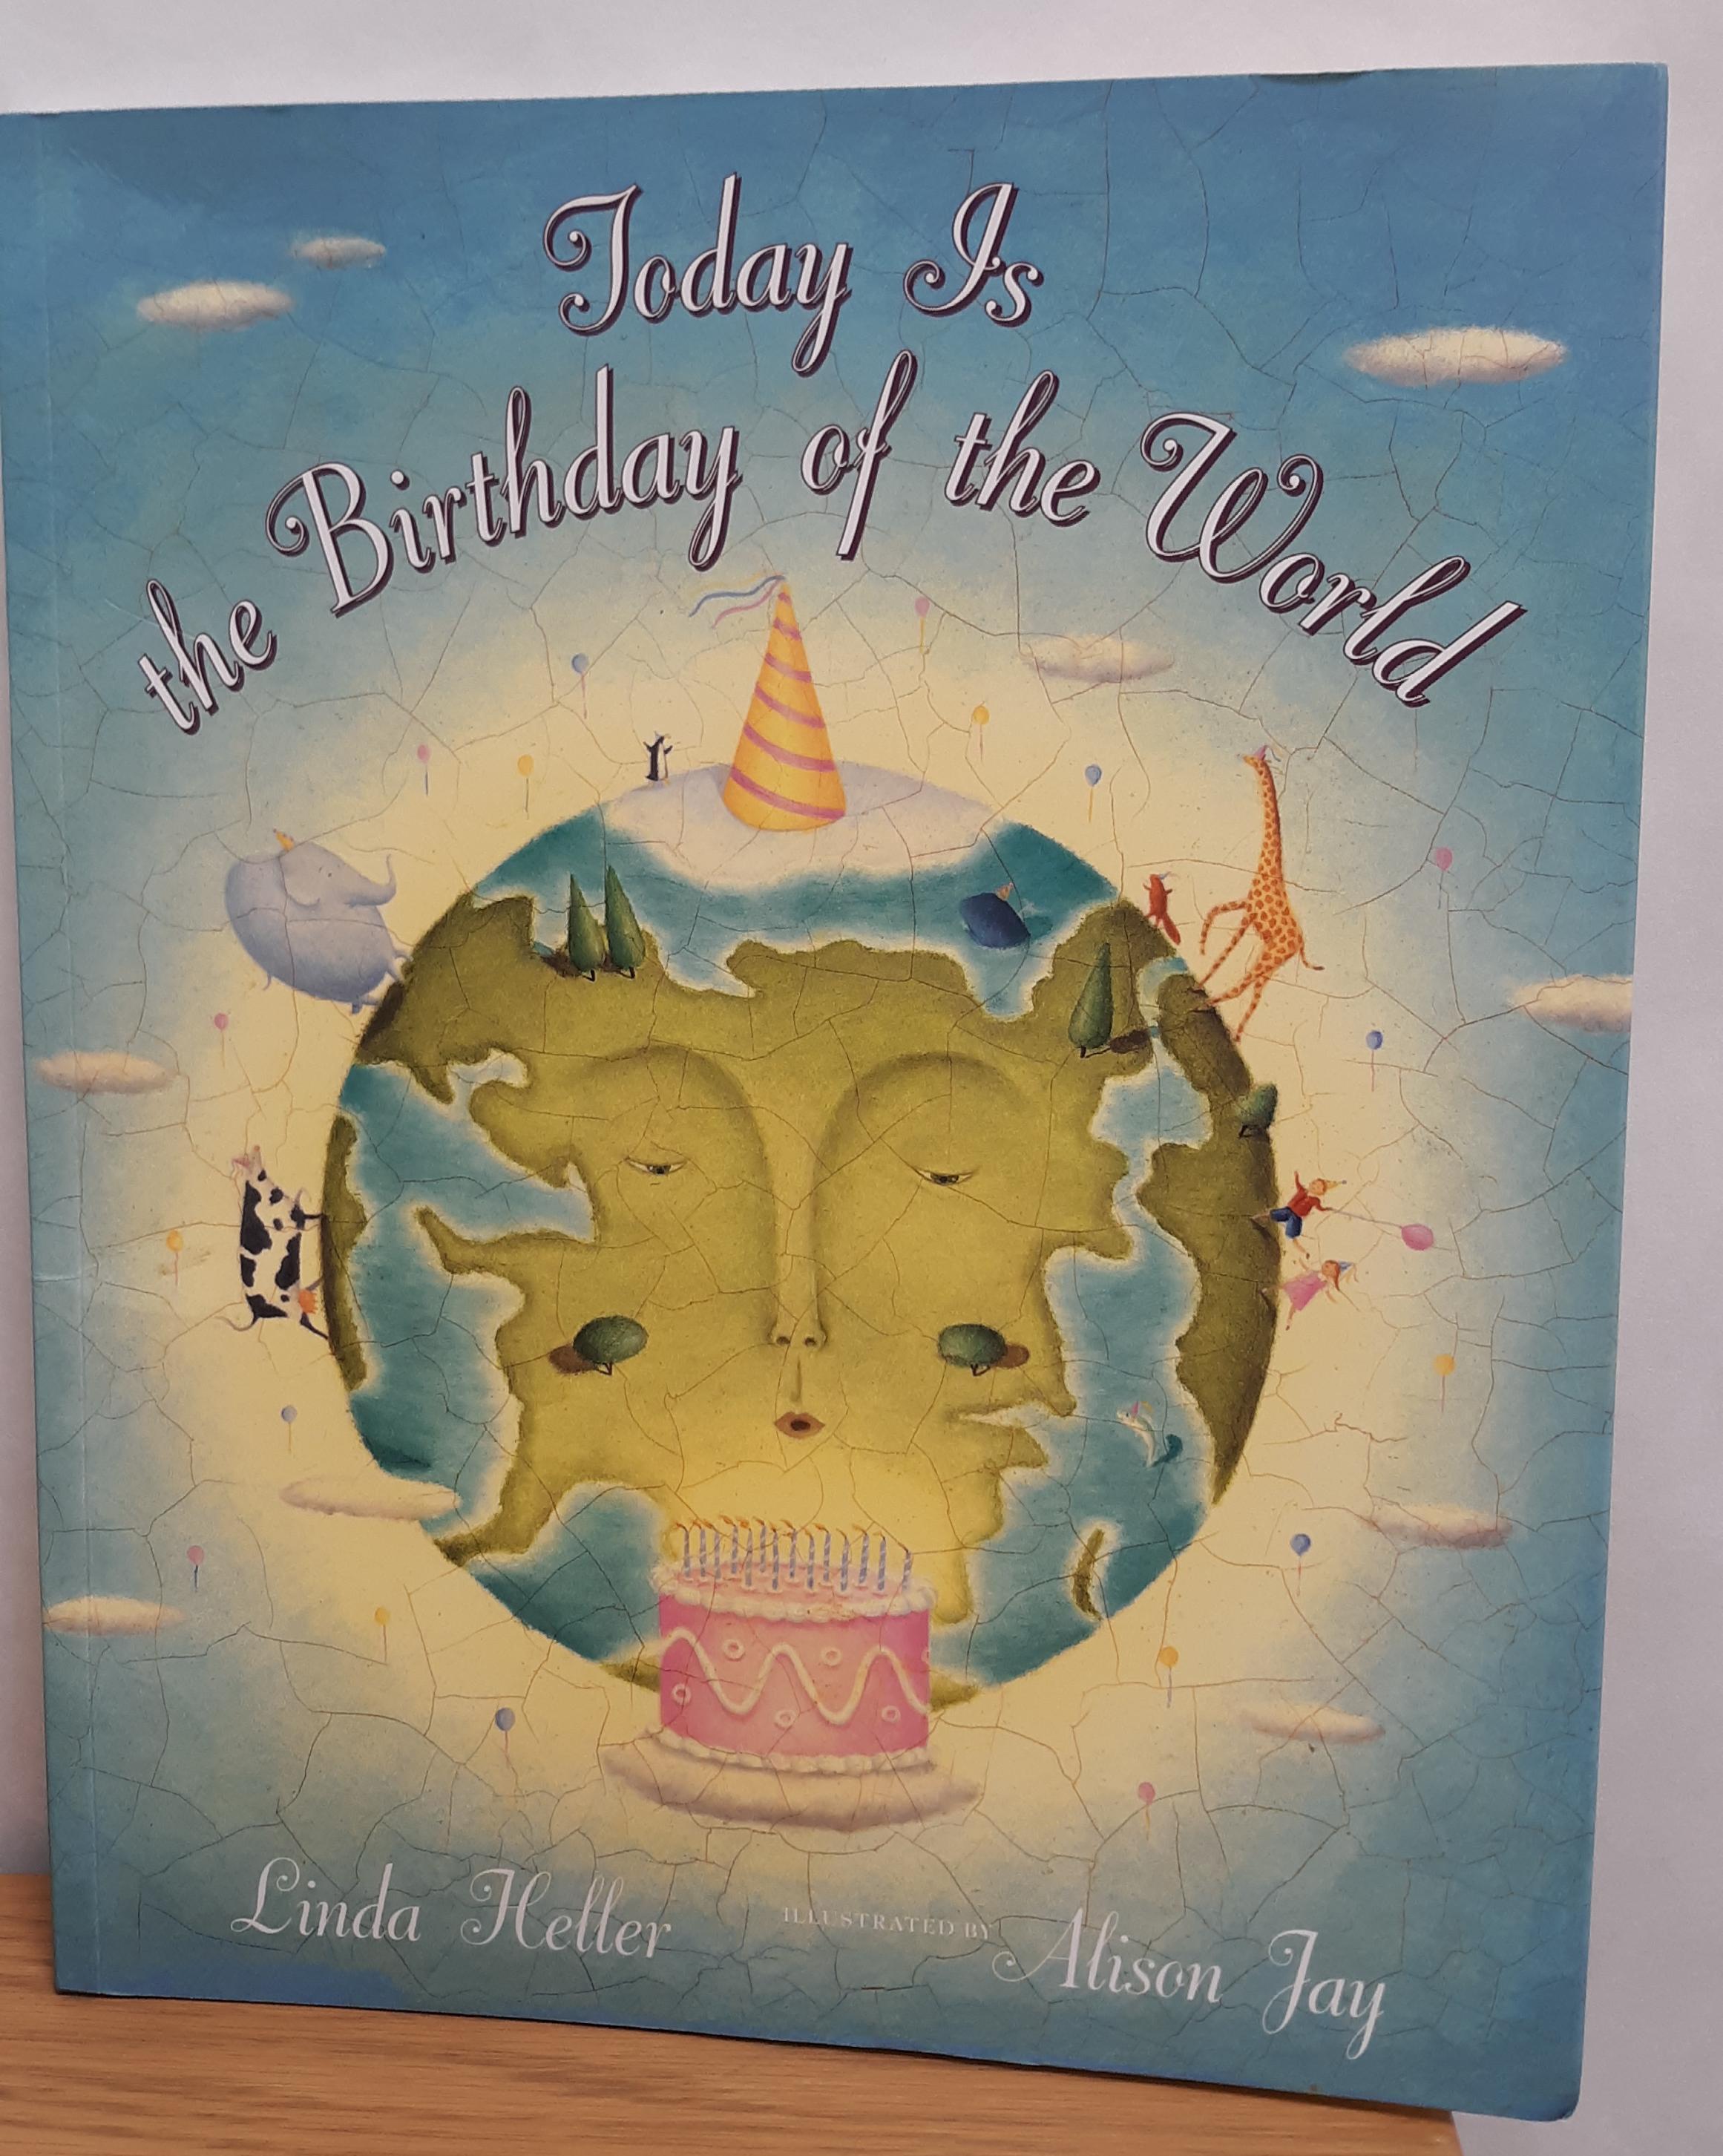 https://0201.nccdn.net/1_2/000/000/198/5a2/birthday-of-the-world.png